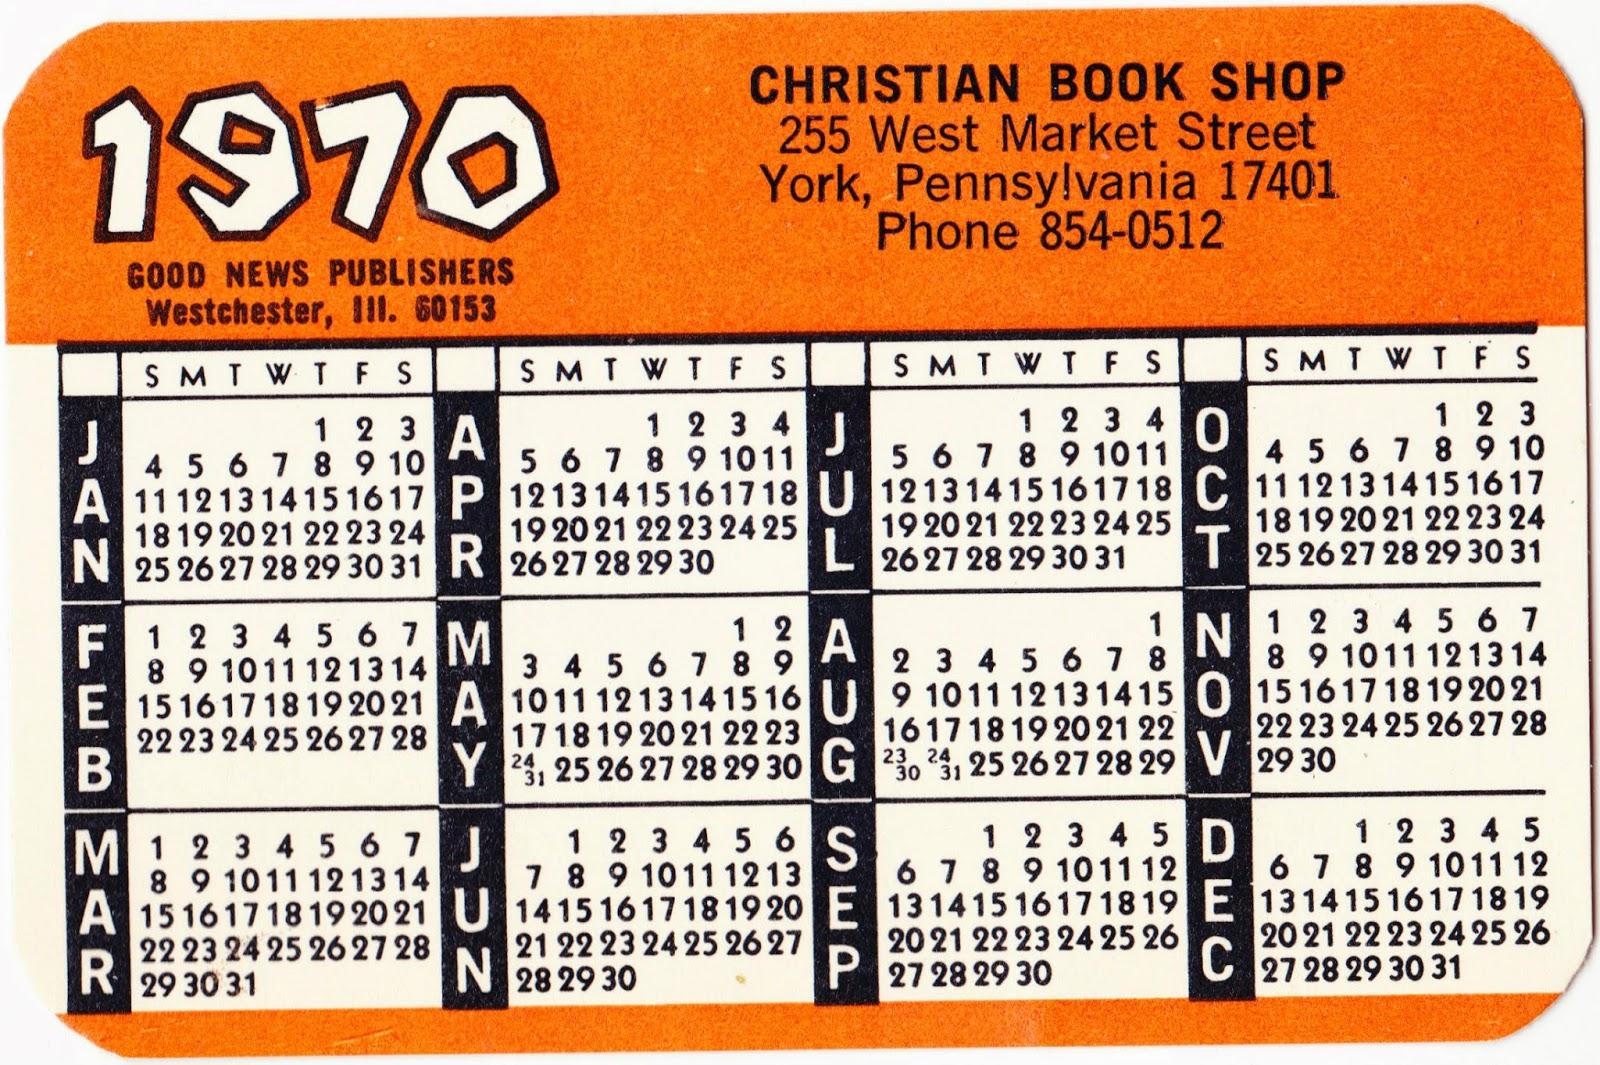 Christian Calendar Publishers Church Liturgical Calendars Ashby Publishing Papergreat 1970 Calendar Tucked Away Inside 1936 Book